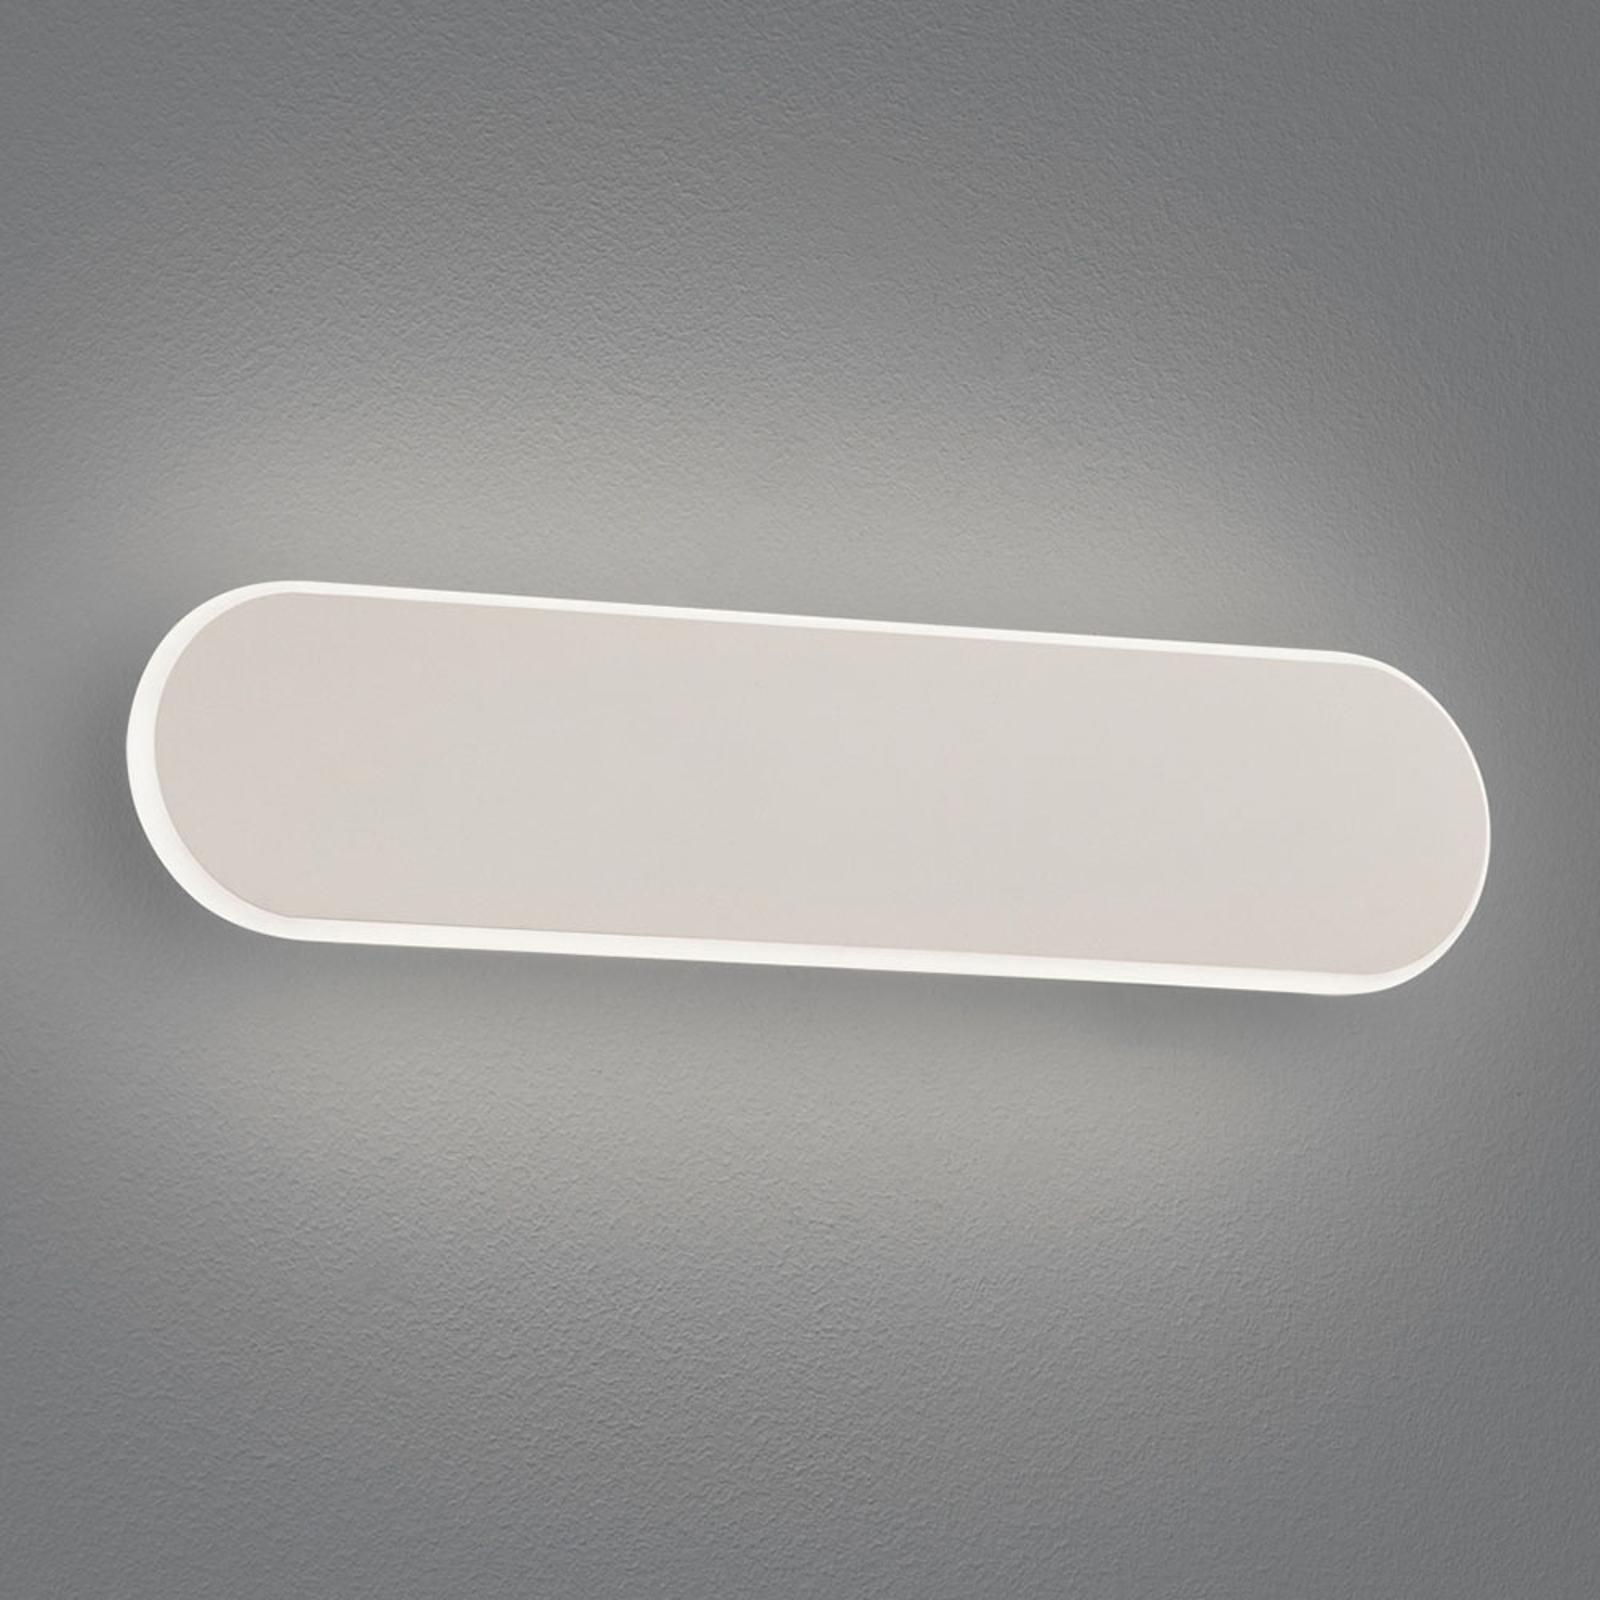 LED-Wandlampe Carlo, SwitchDim, 35 cm, weiß